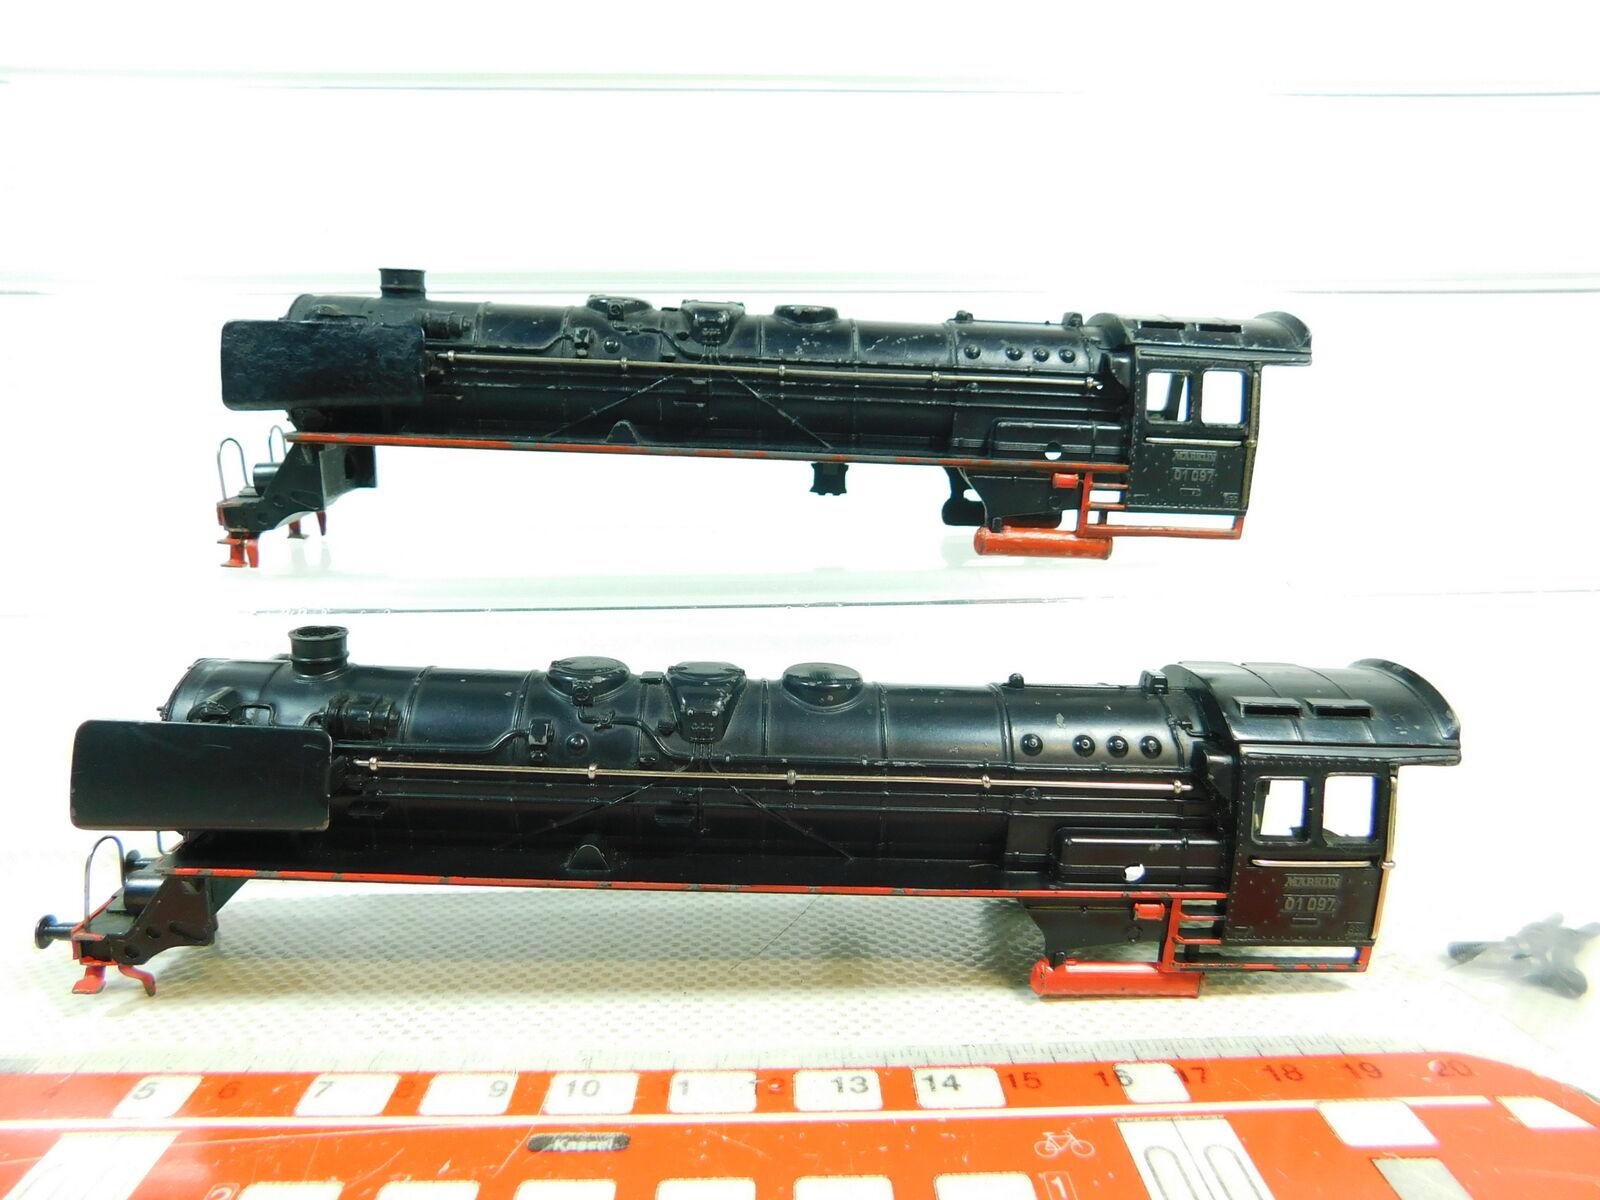 BT297-1 2x   H0 Corpo Ghisa per F 800 Locomotiva a Vapore 01 097, 2. Wahl